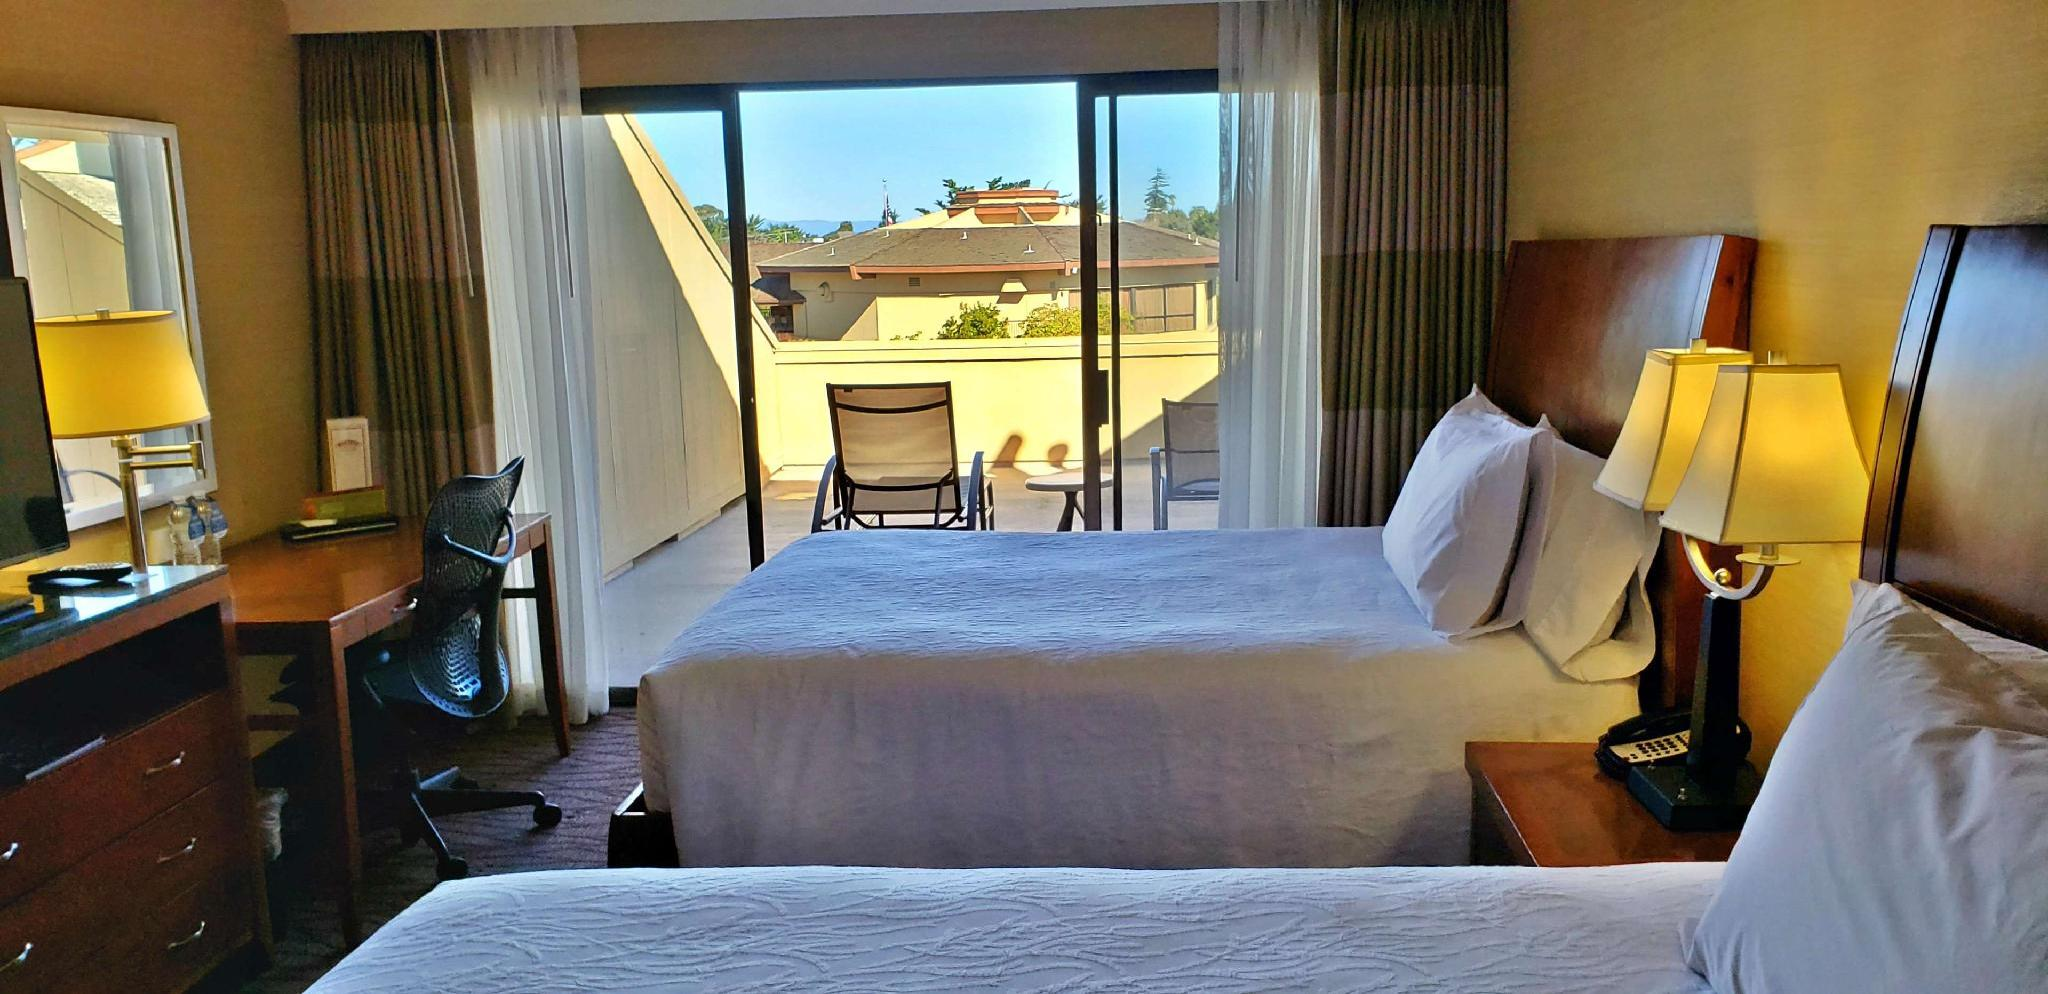 2 Queen Beds Large Patio